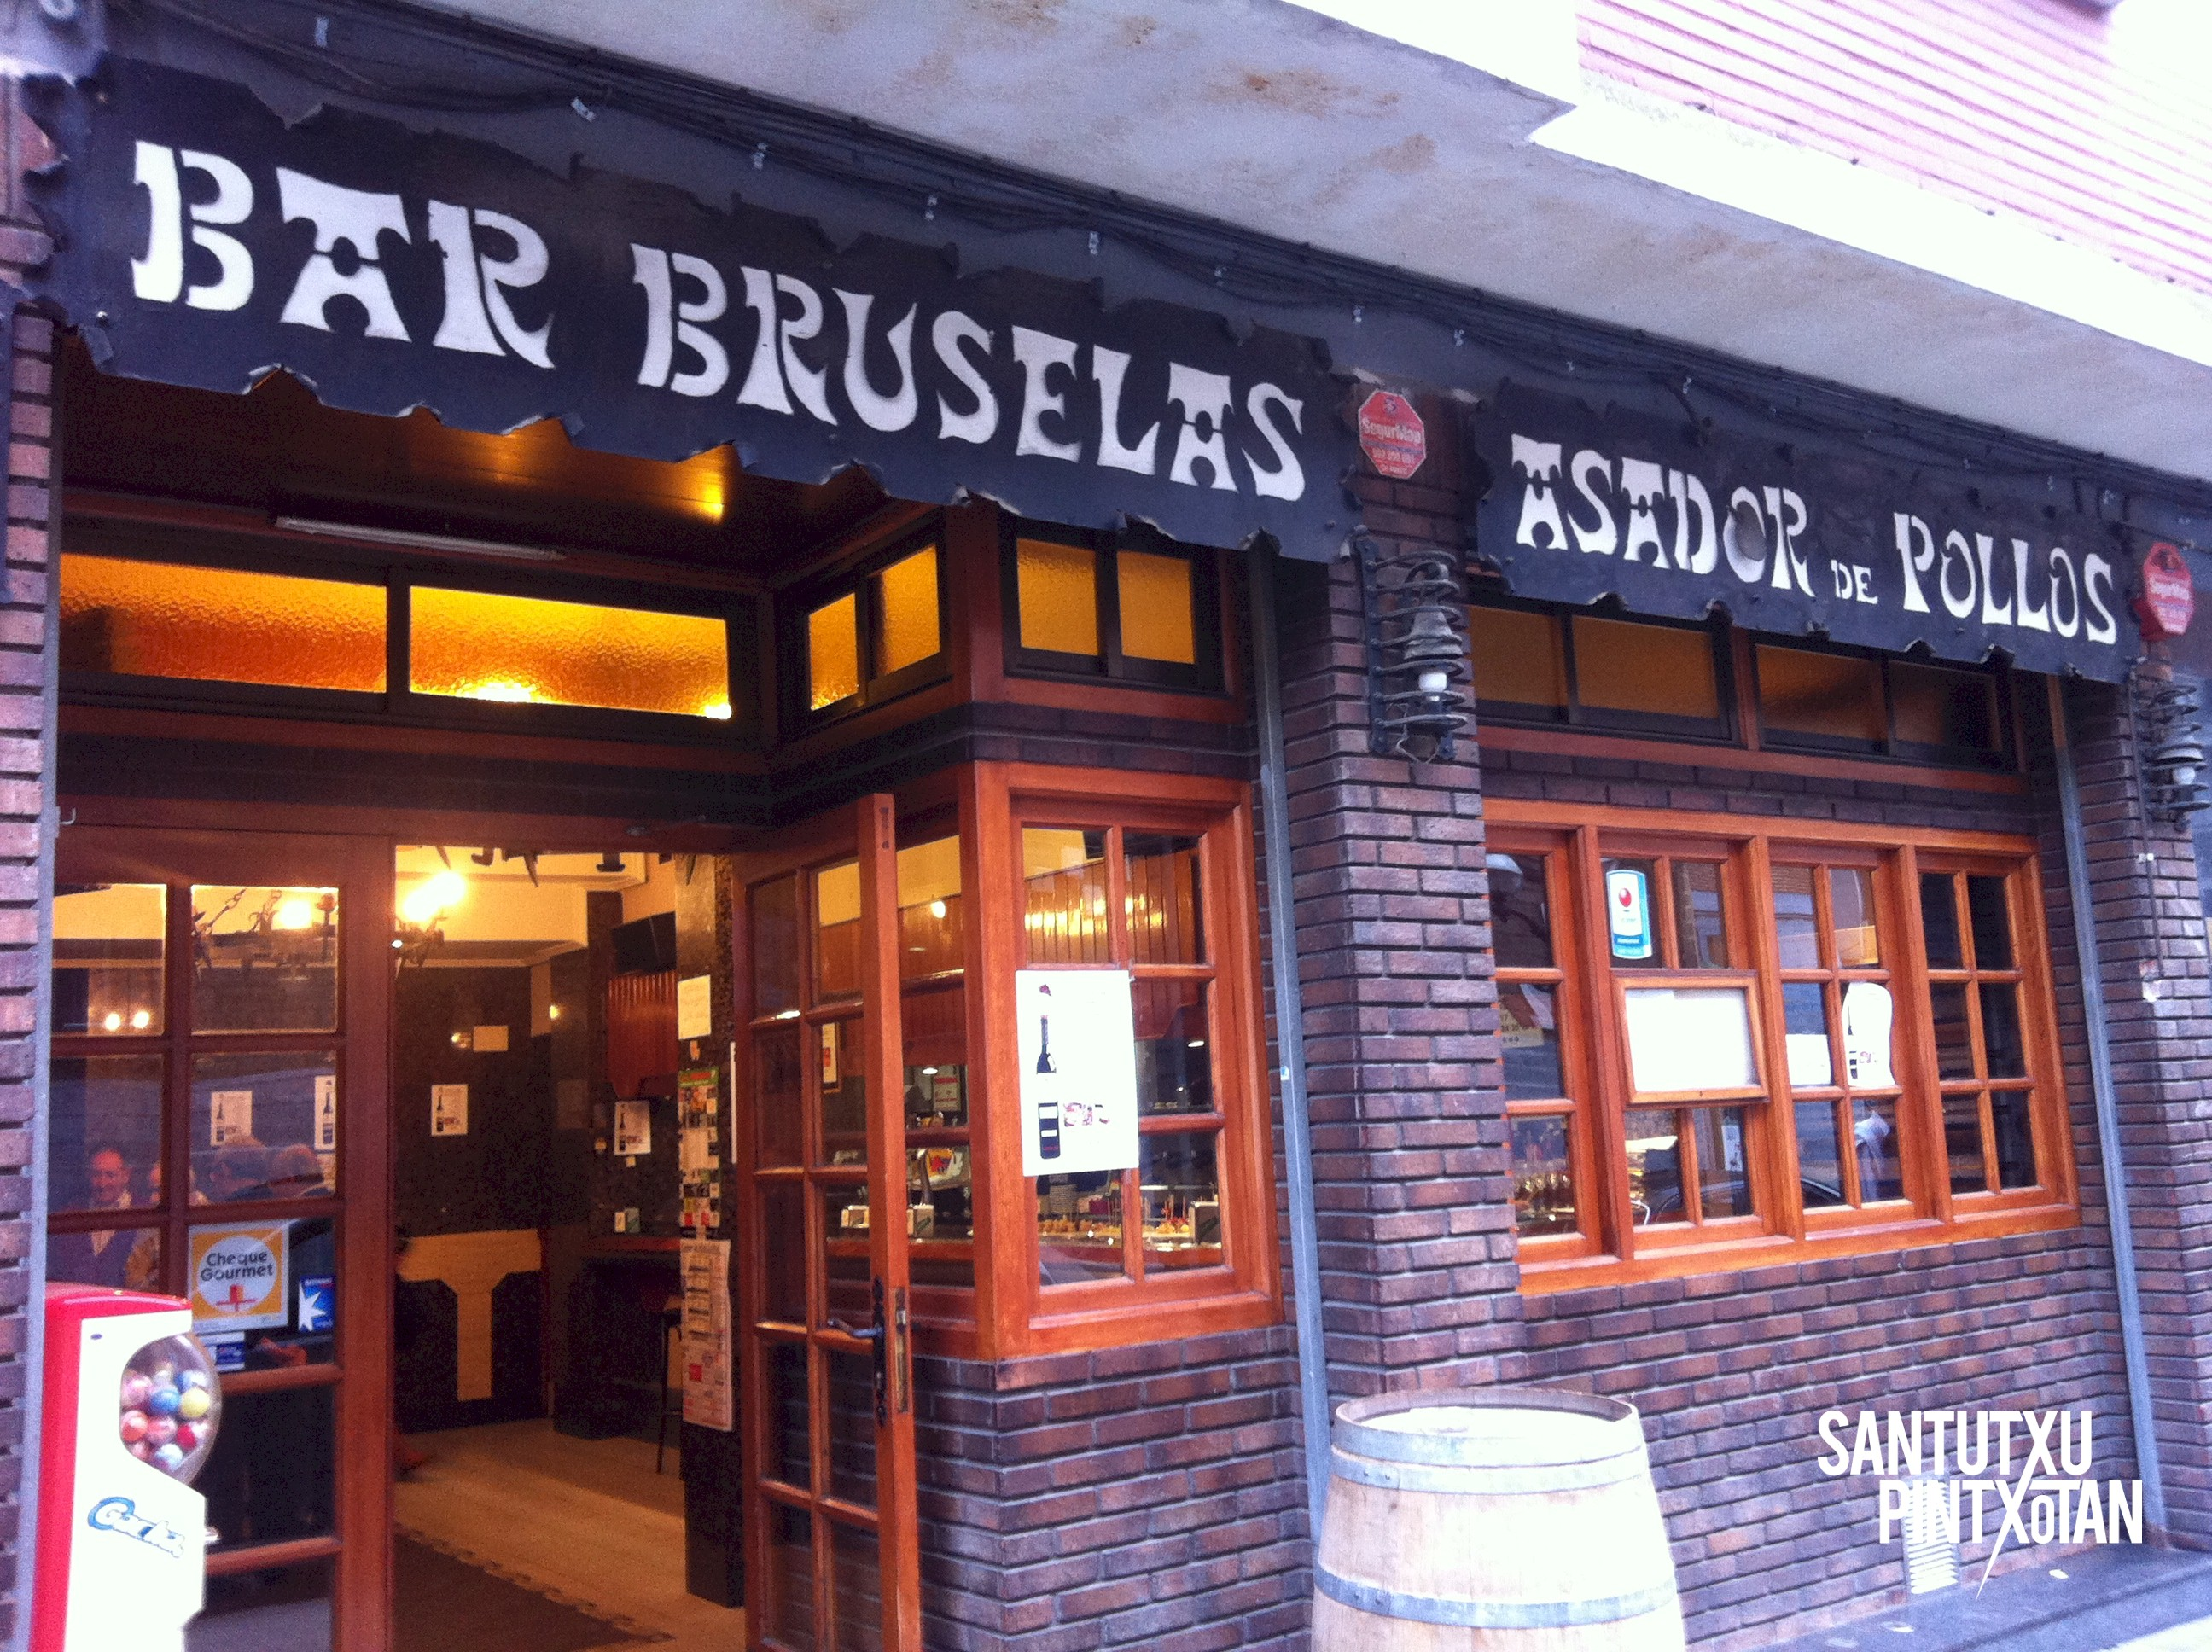 Bar Bruselas asador Santutxu